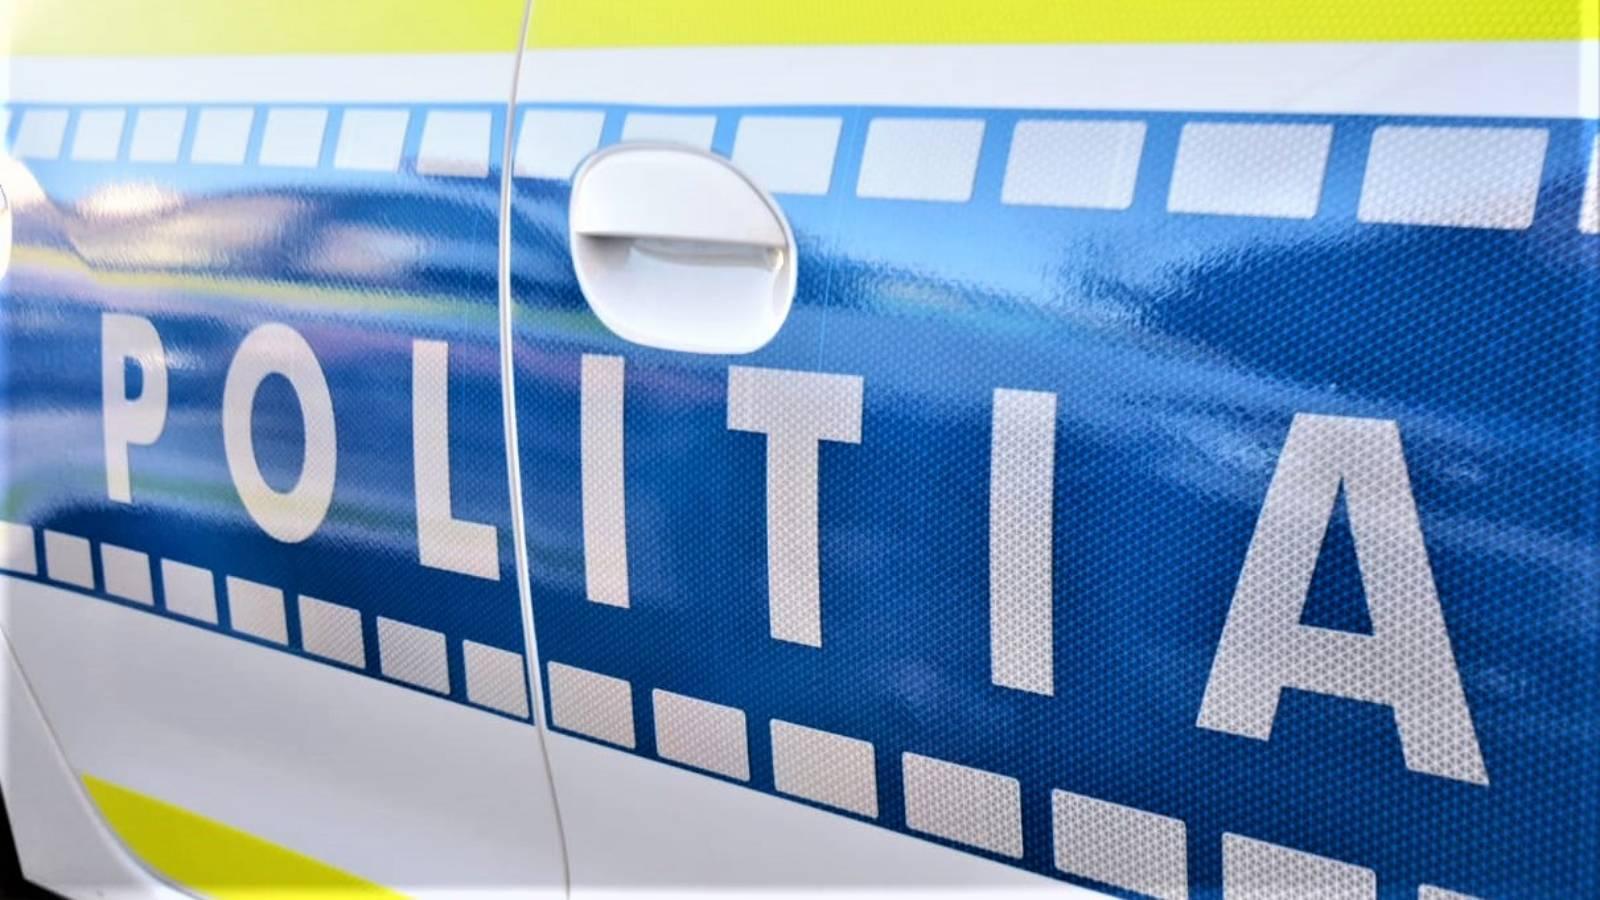 Politia Romana prevenire